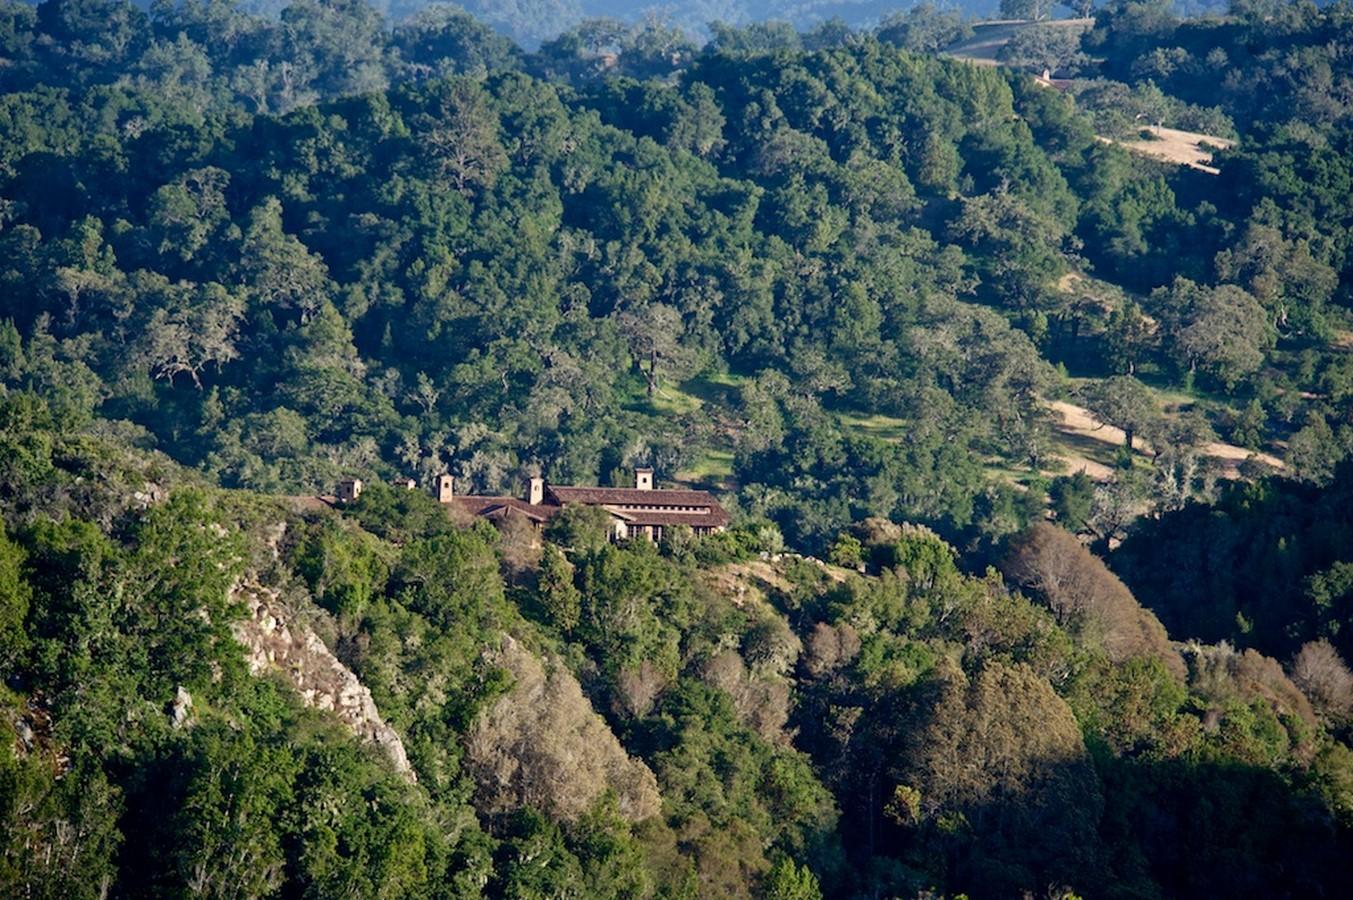 The Santa Luca preserve, Carmel, California - Sheet1